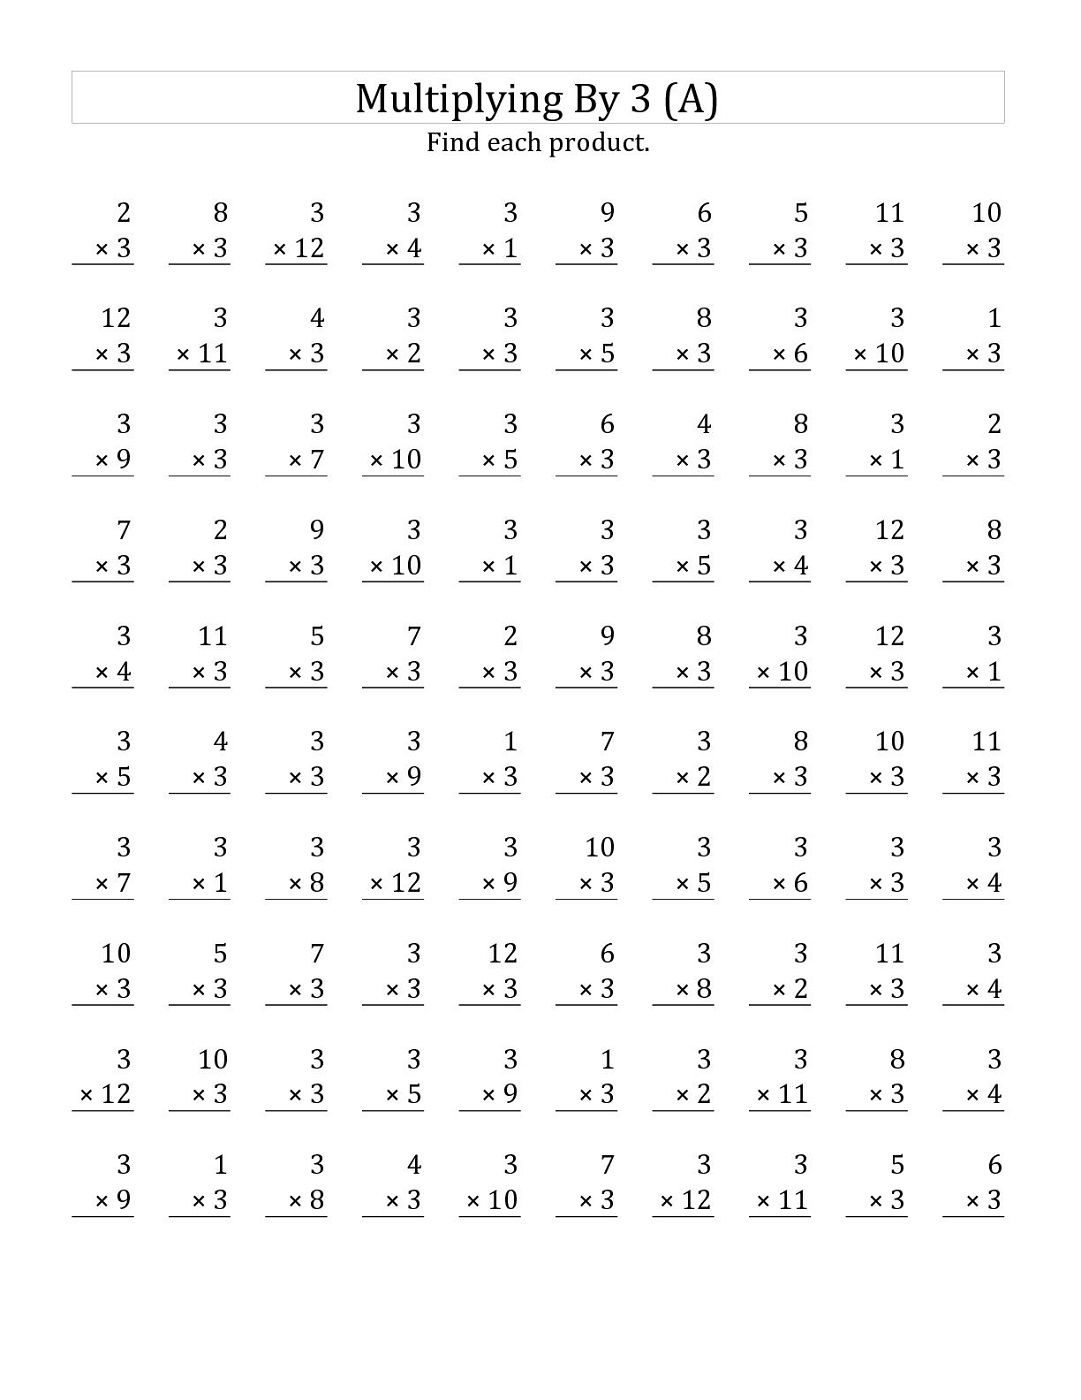 Multiply By 3 Worksheet